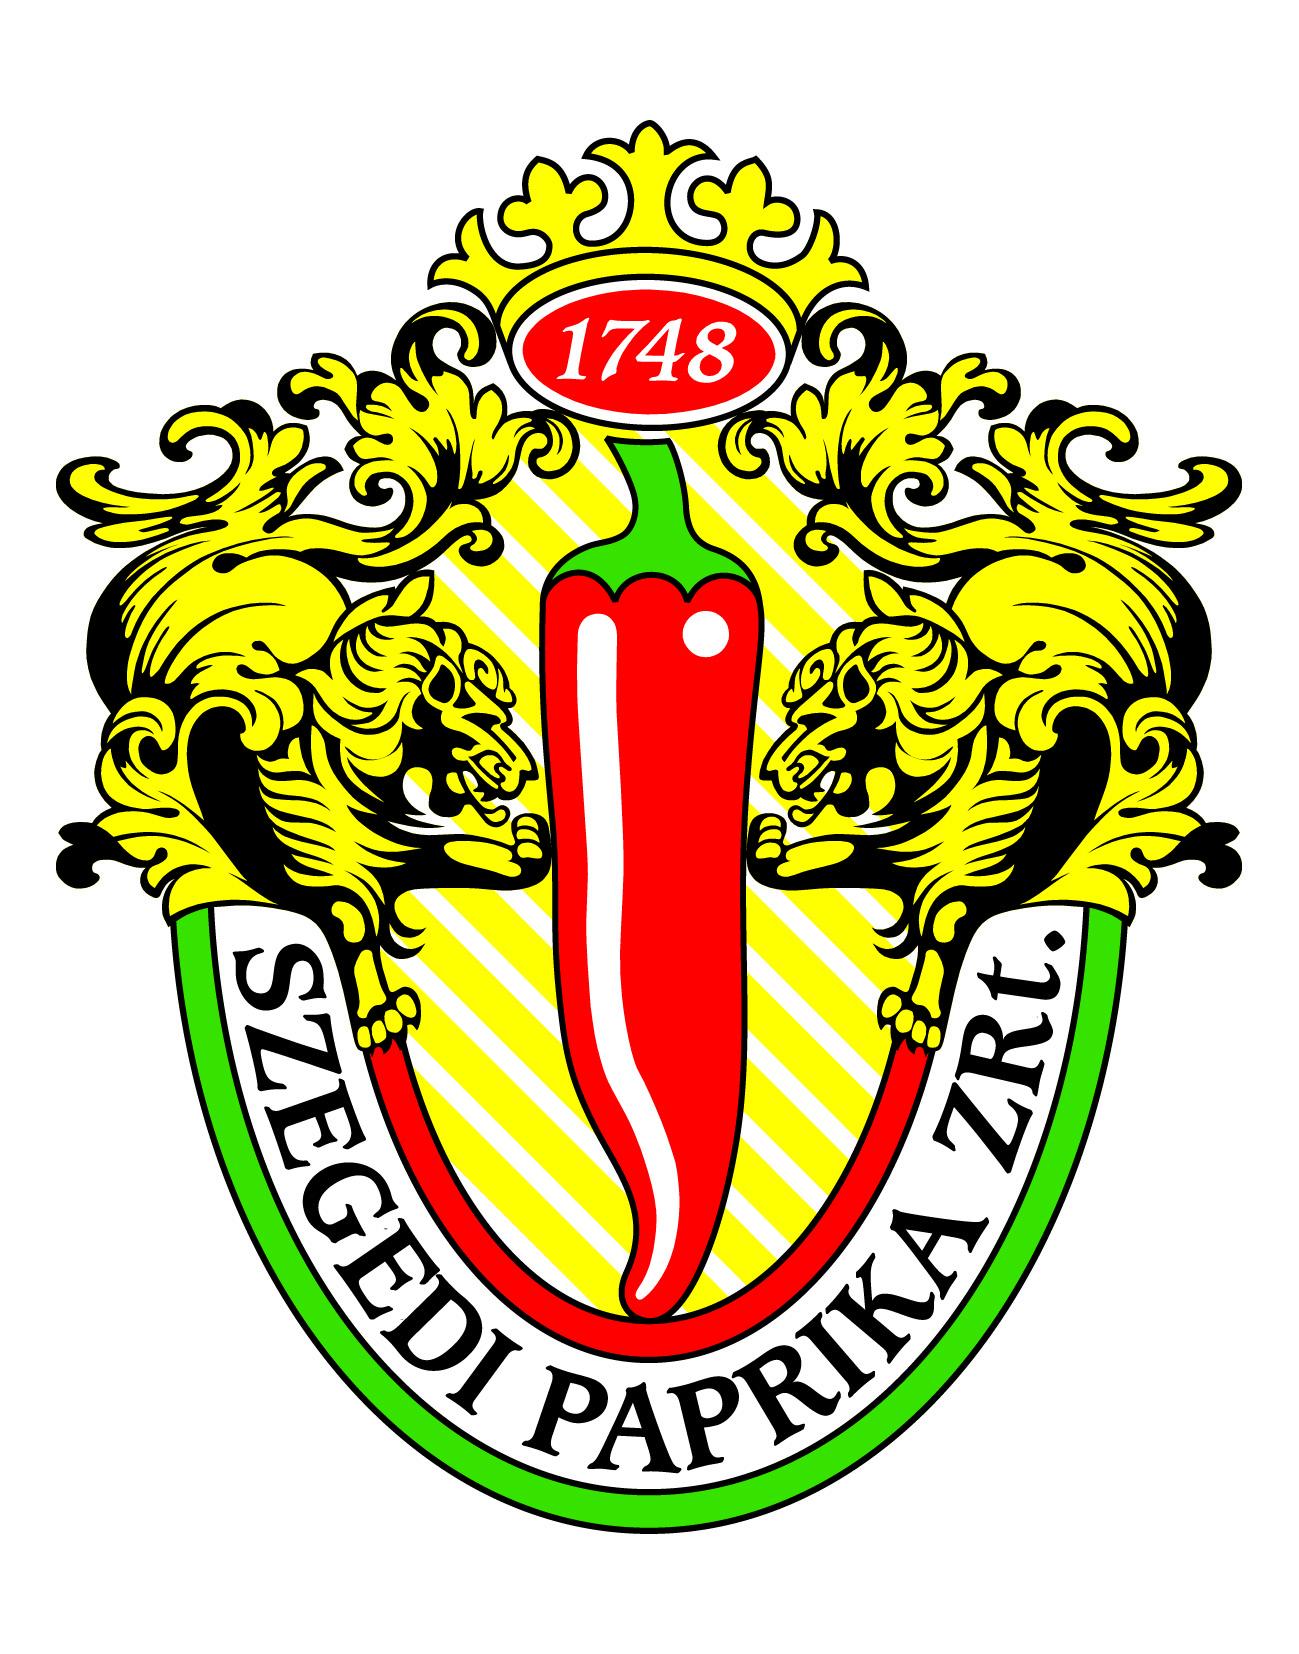 Szegedi Paprika Zrt